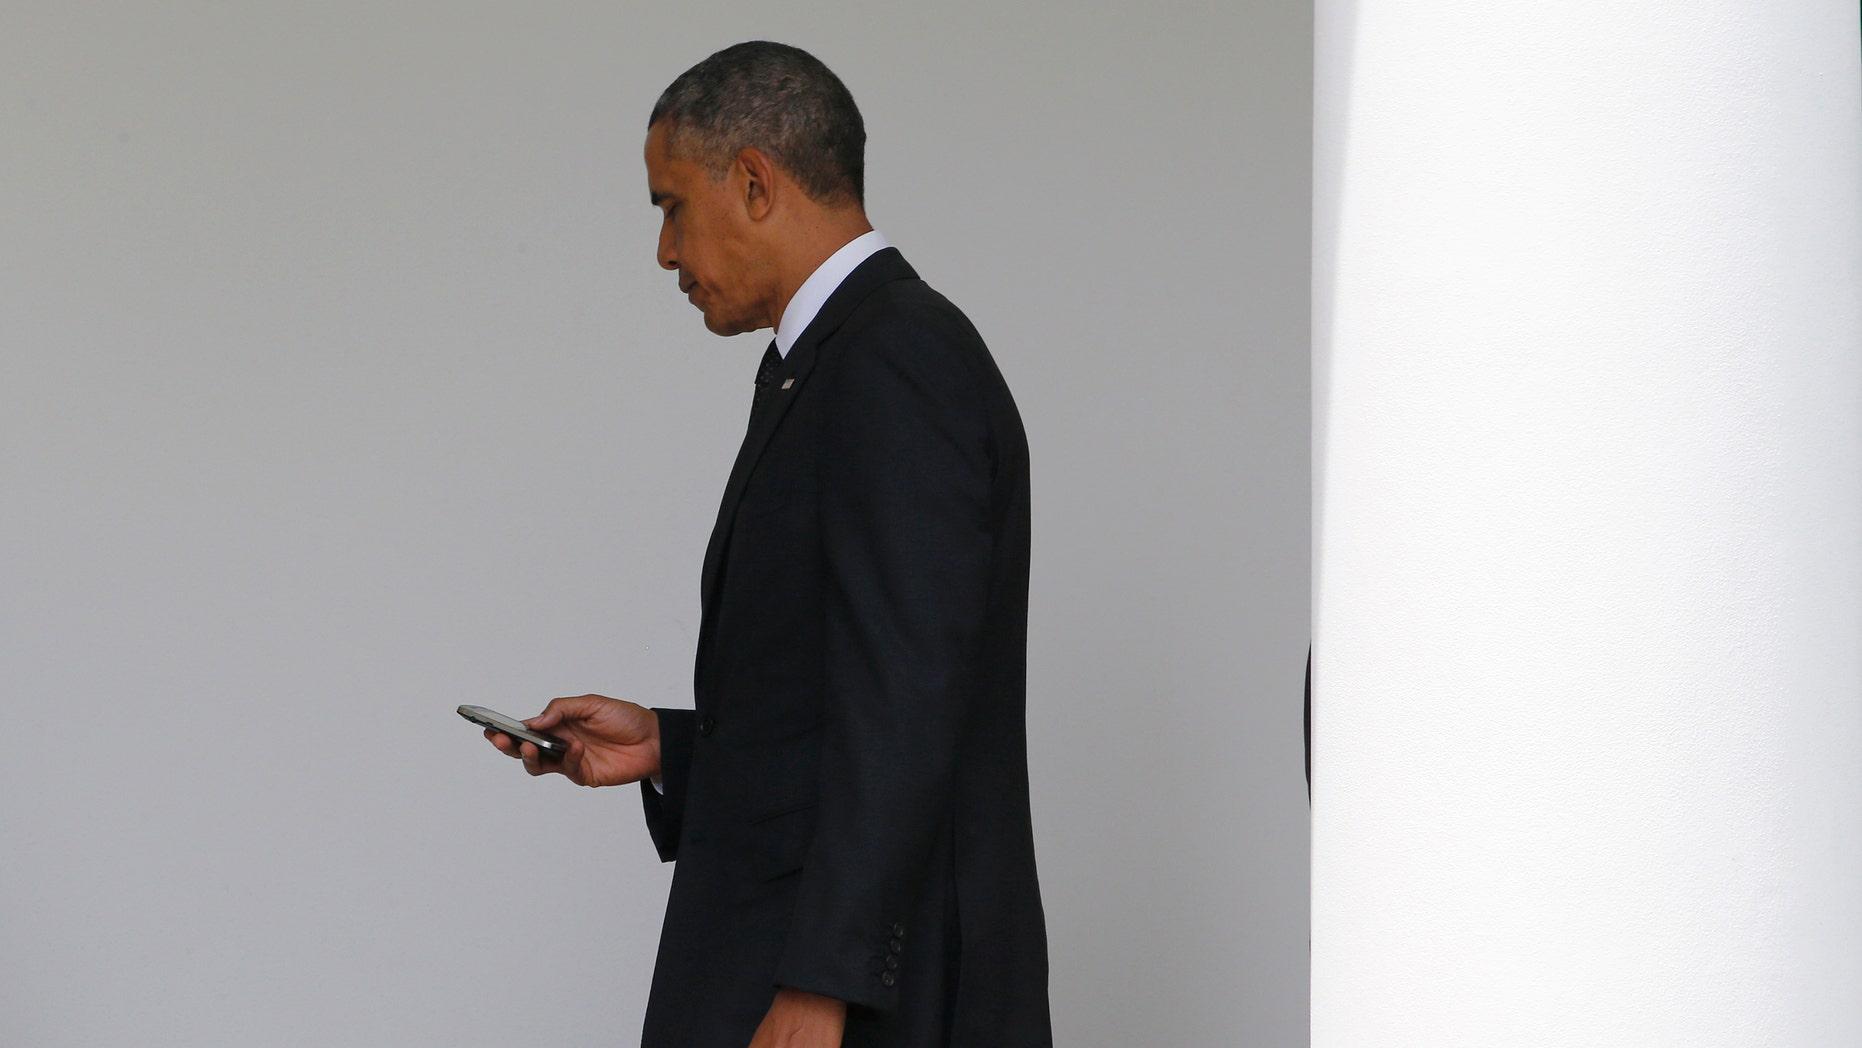 File photo - President Barack Obama checks his Blackberry smartphone.